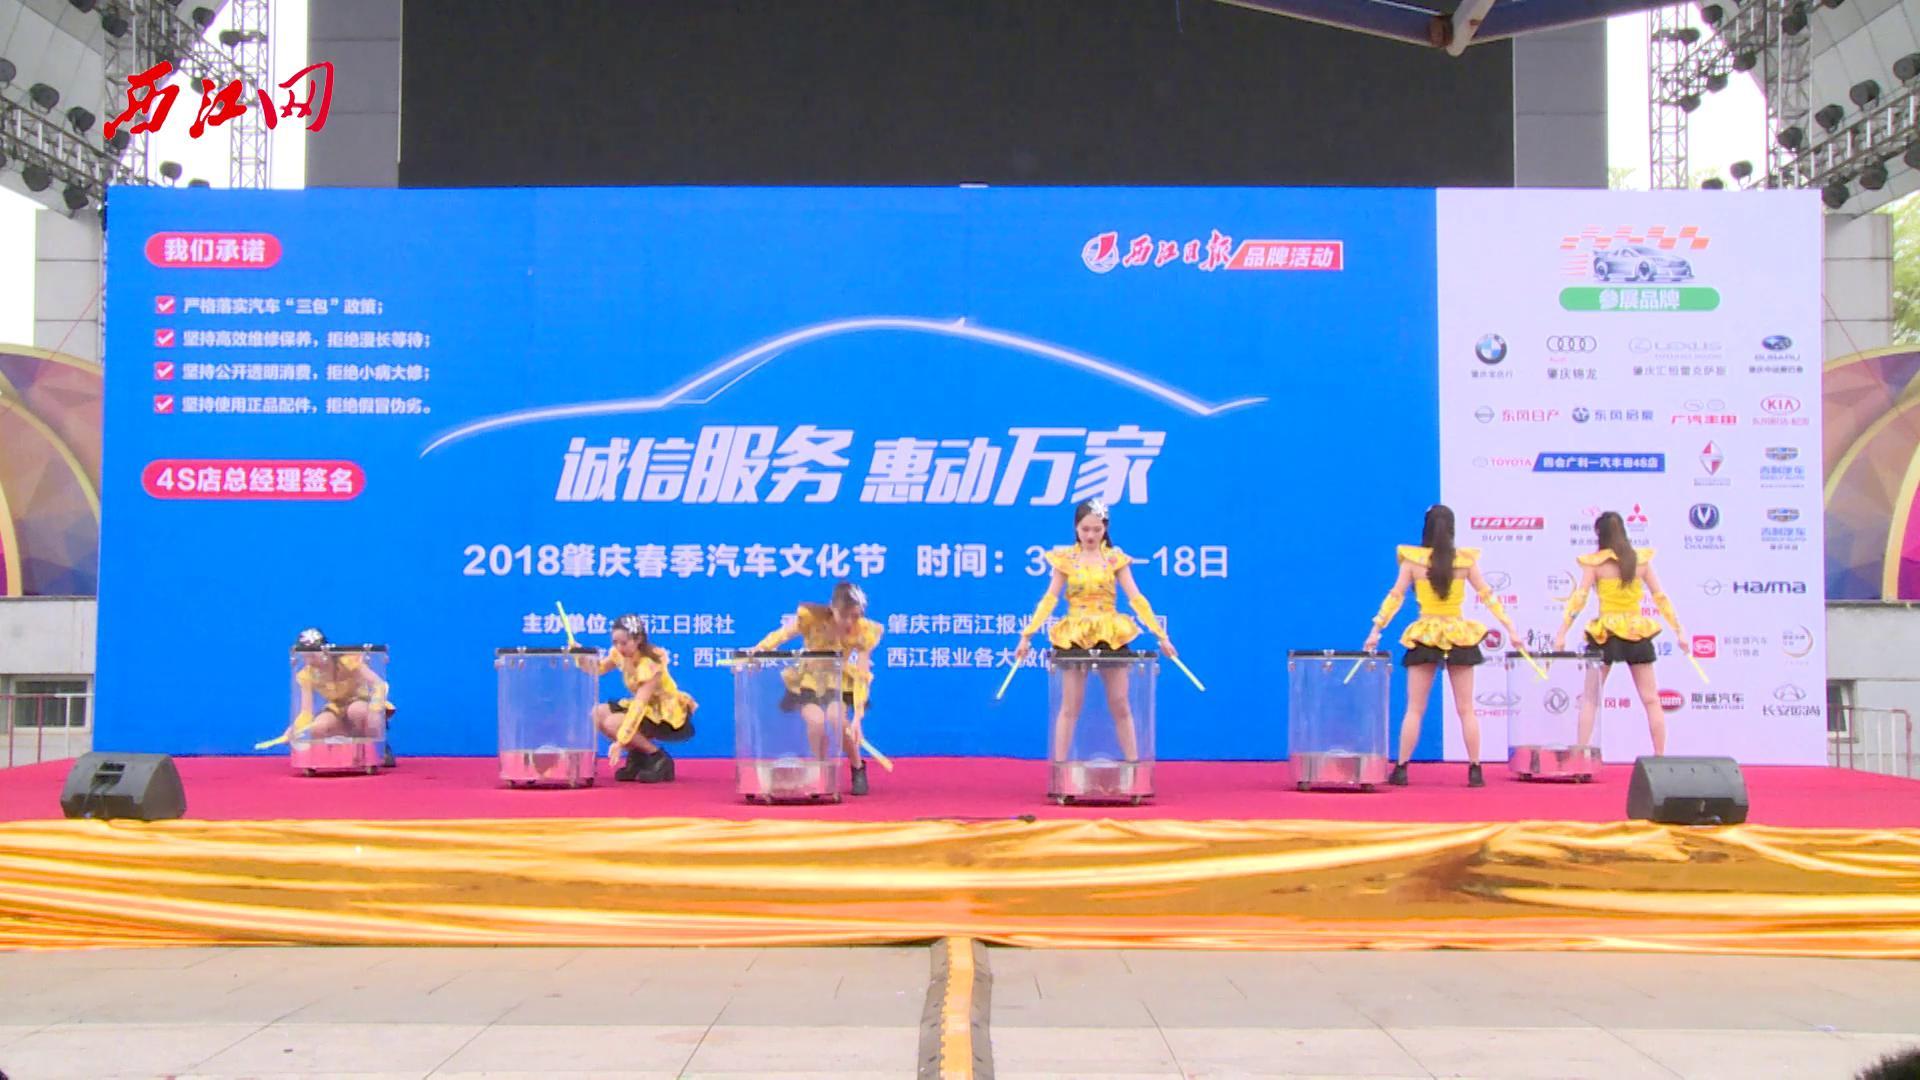 2018nba虎扑篮球:春季汽车文化节:诚信服务 惠动万家